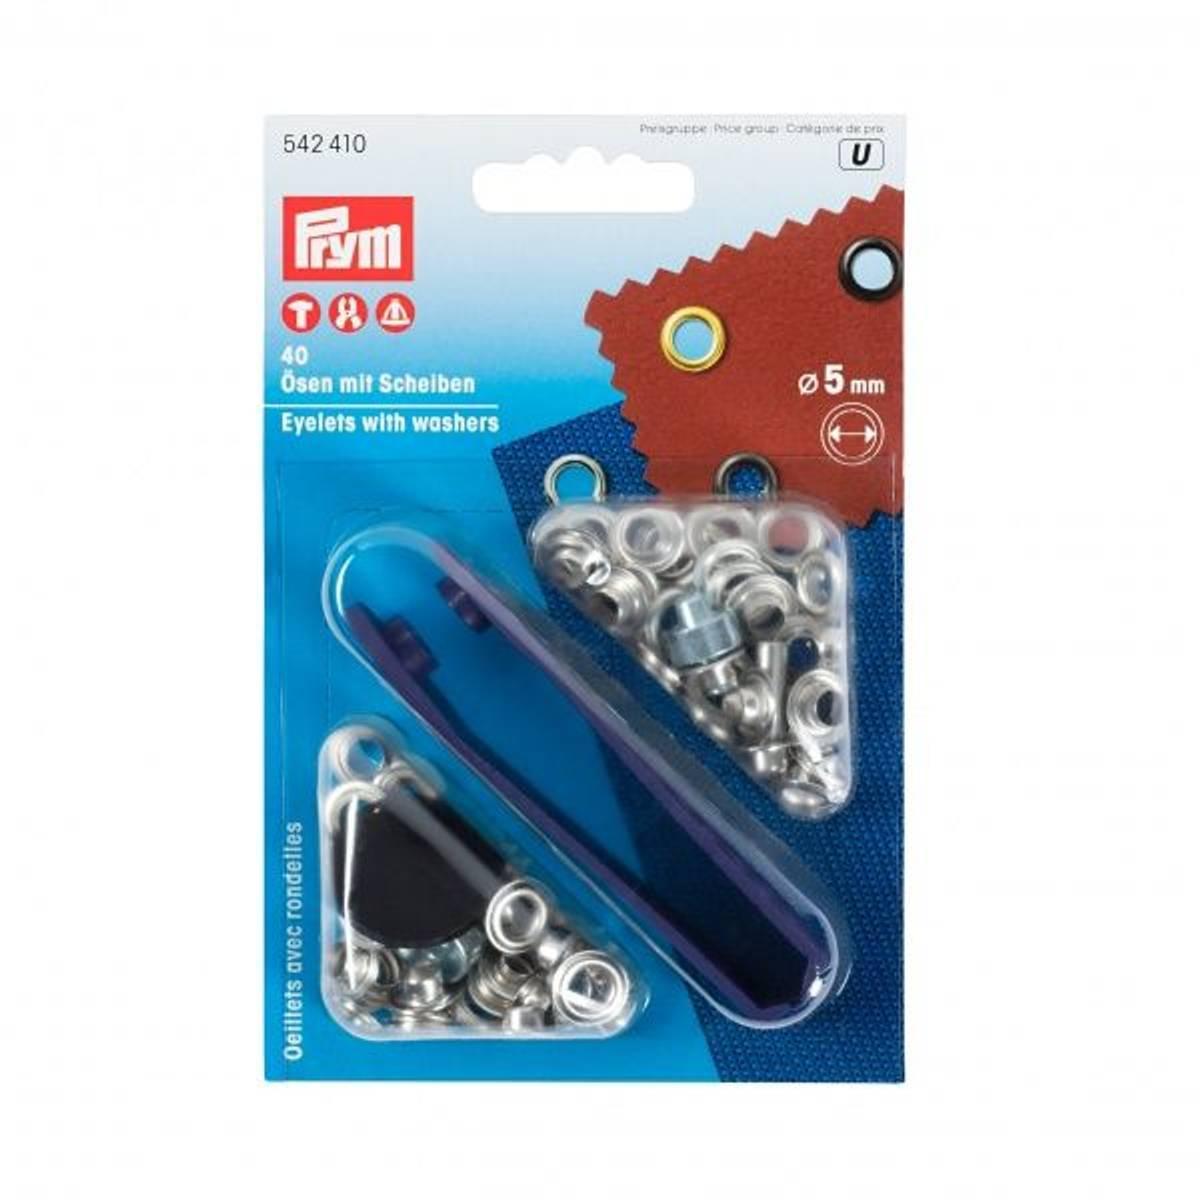 Prym Maljer, 5mm, 40stk, sølv, 542410